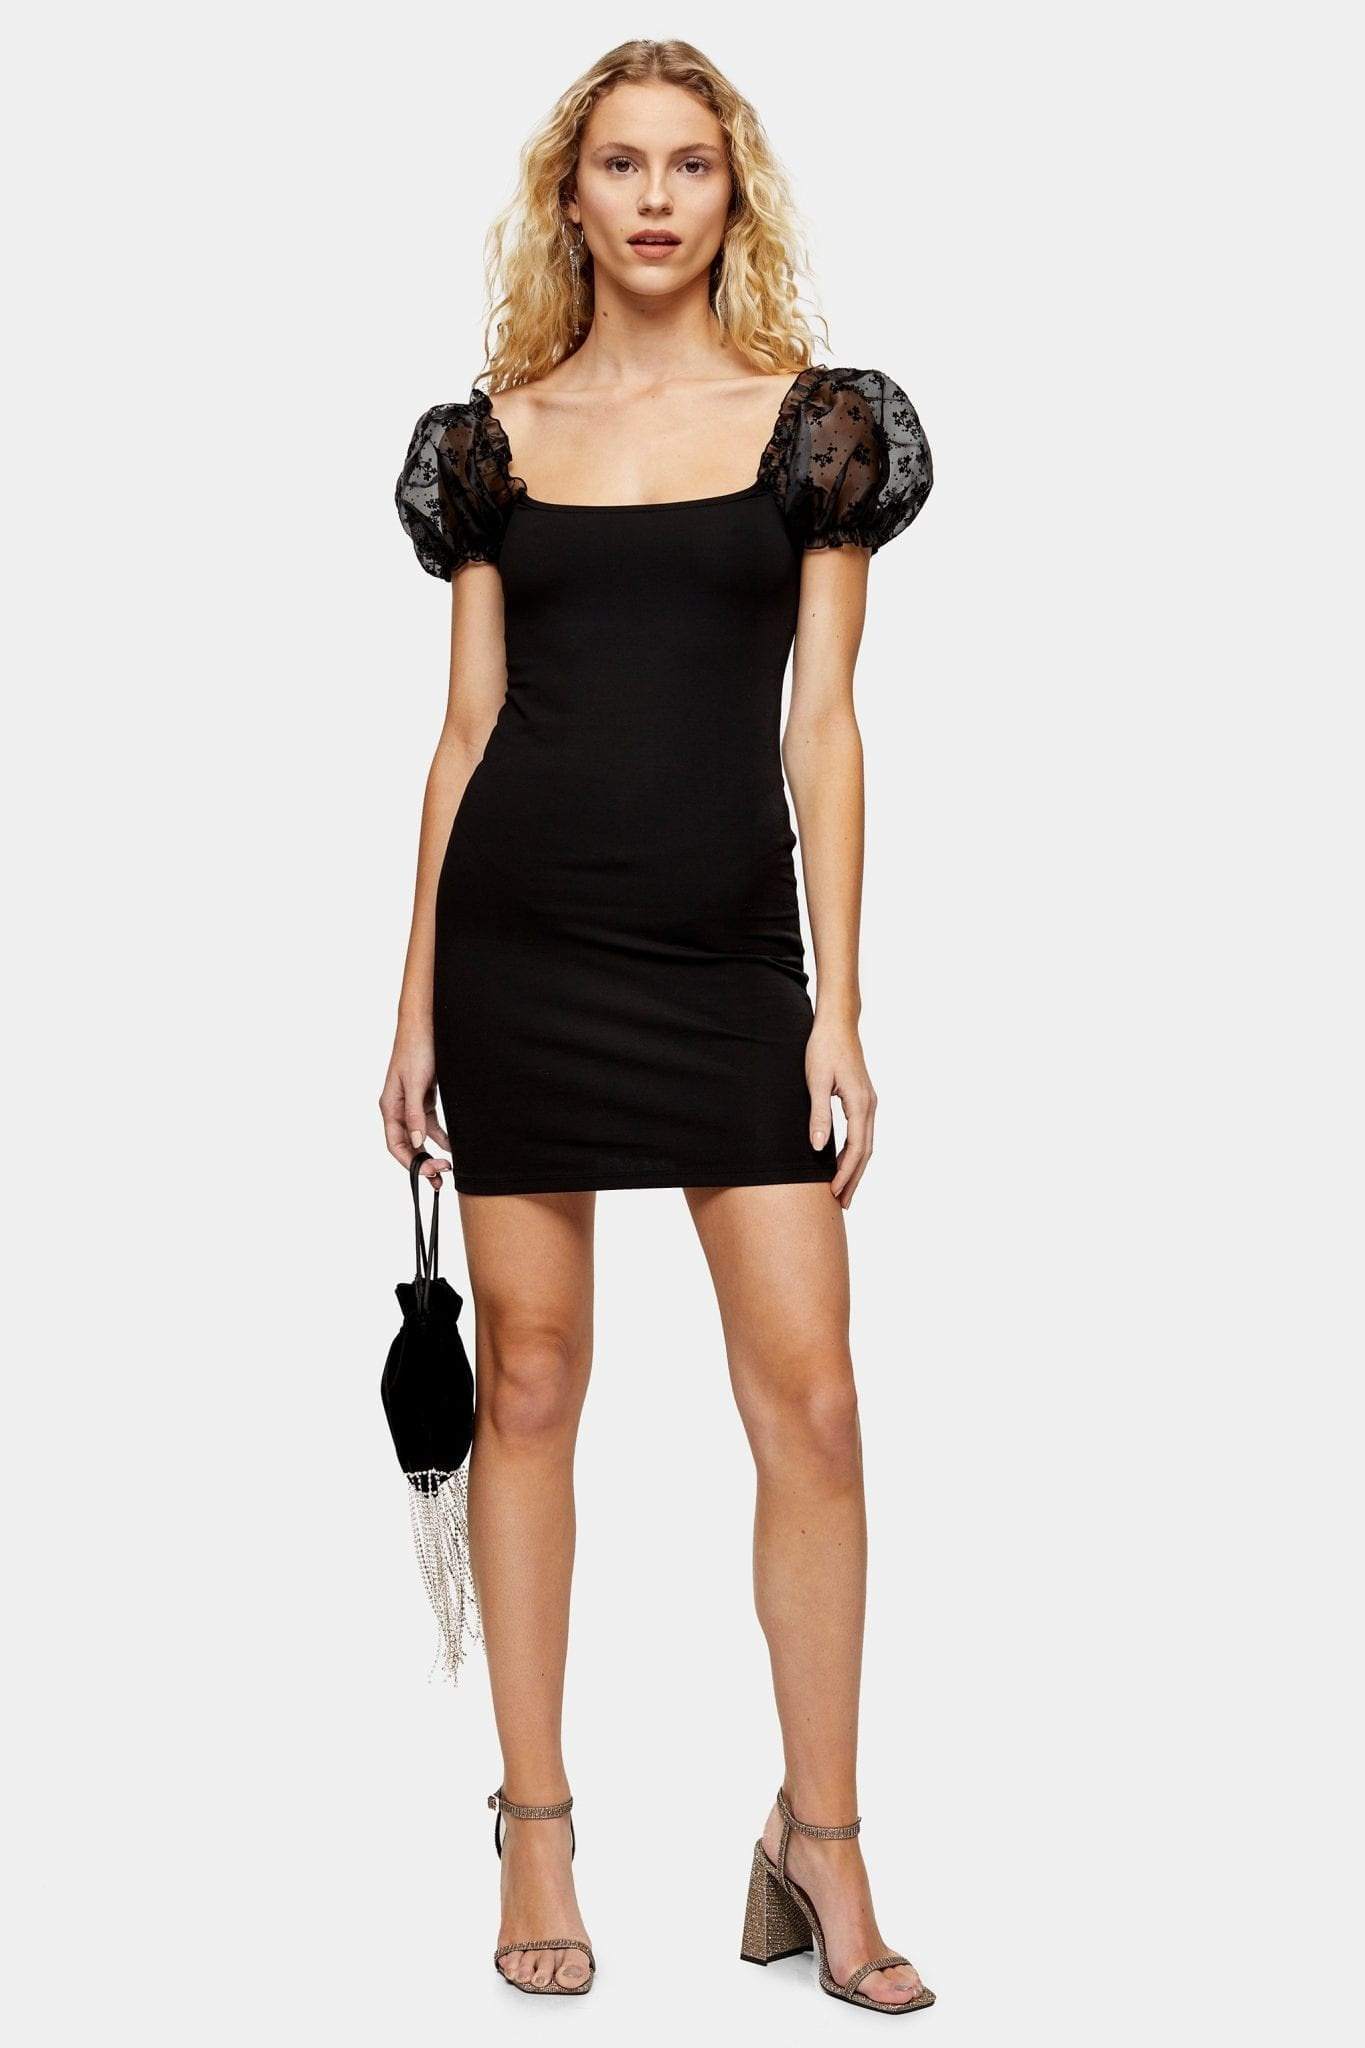 TOPSHOP Black Organza Mini Dress